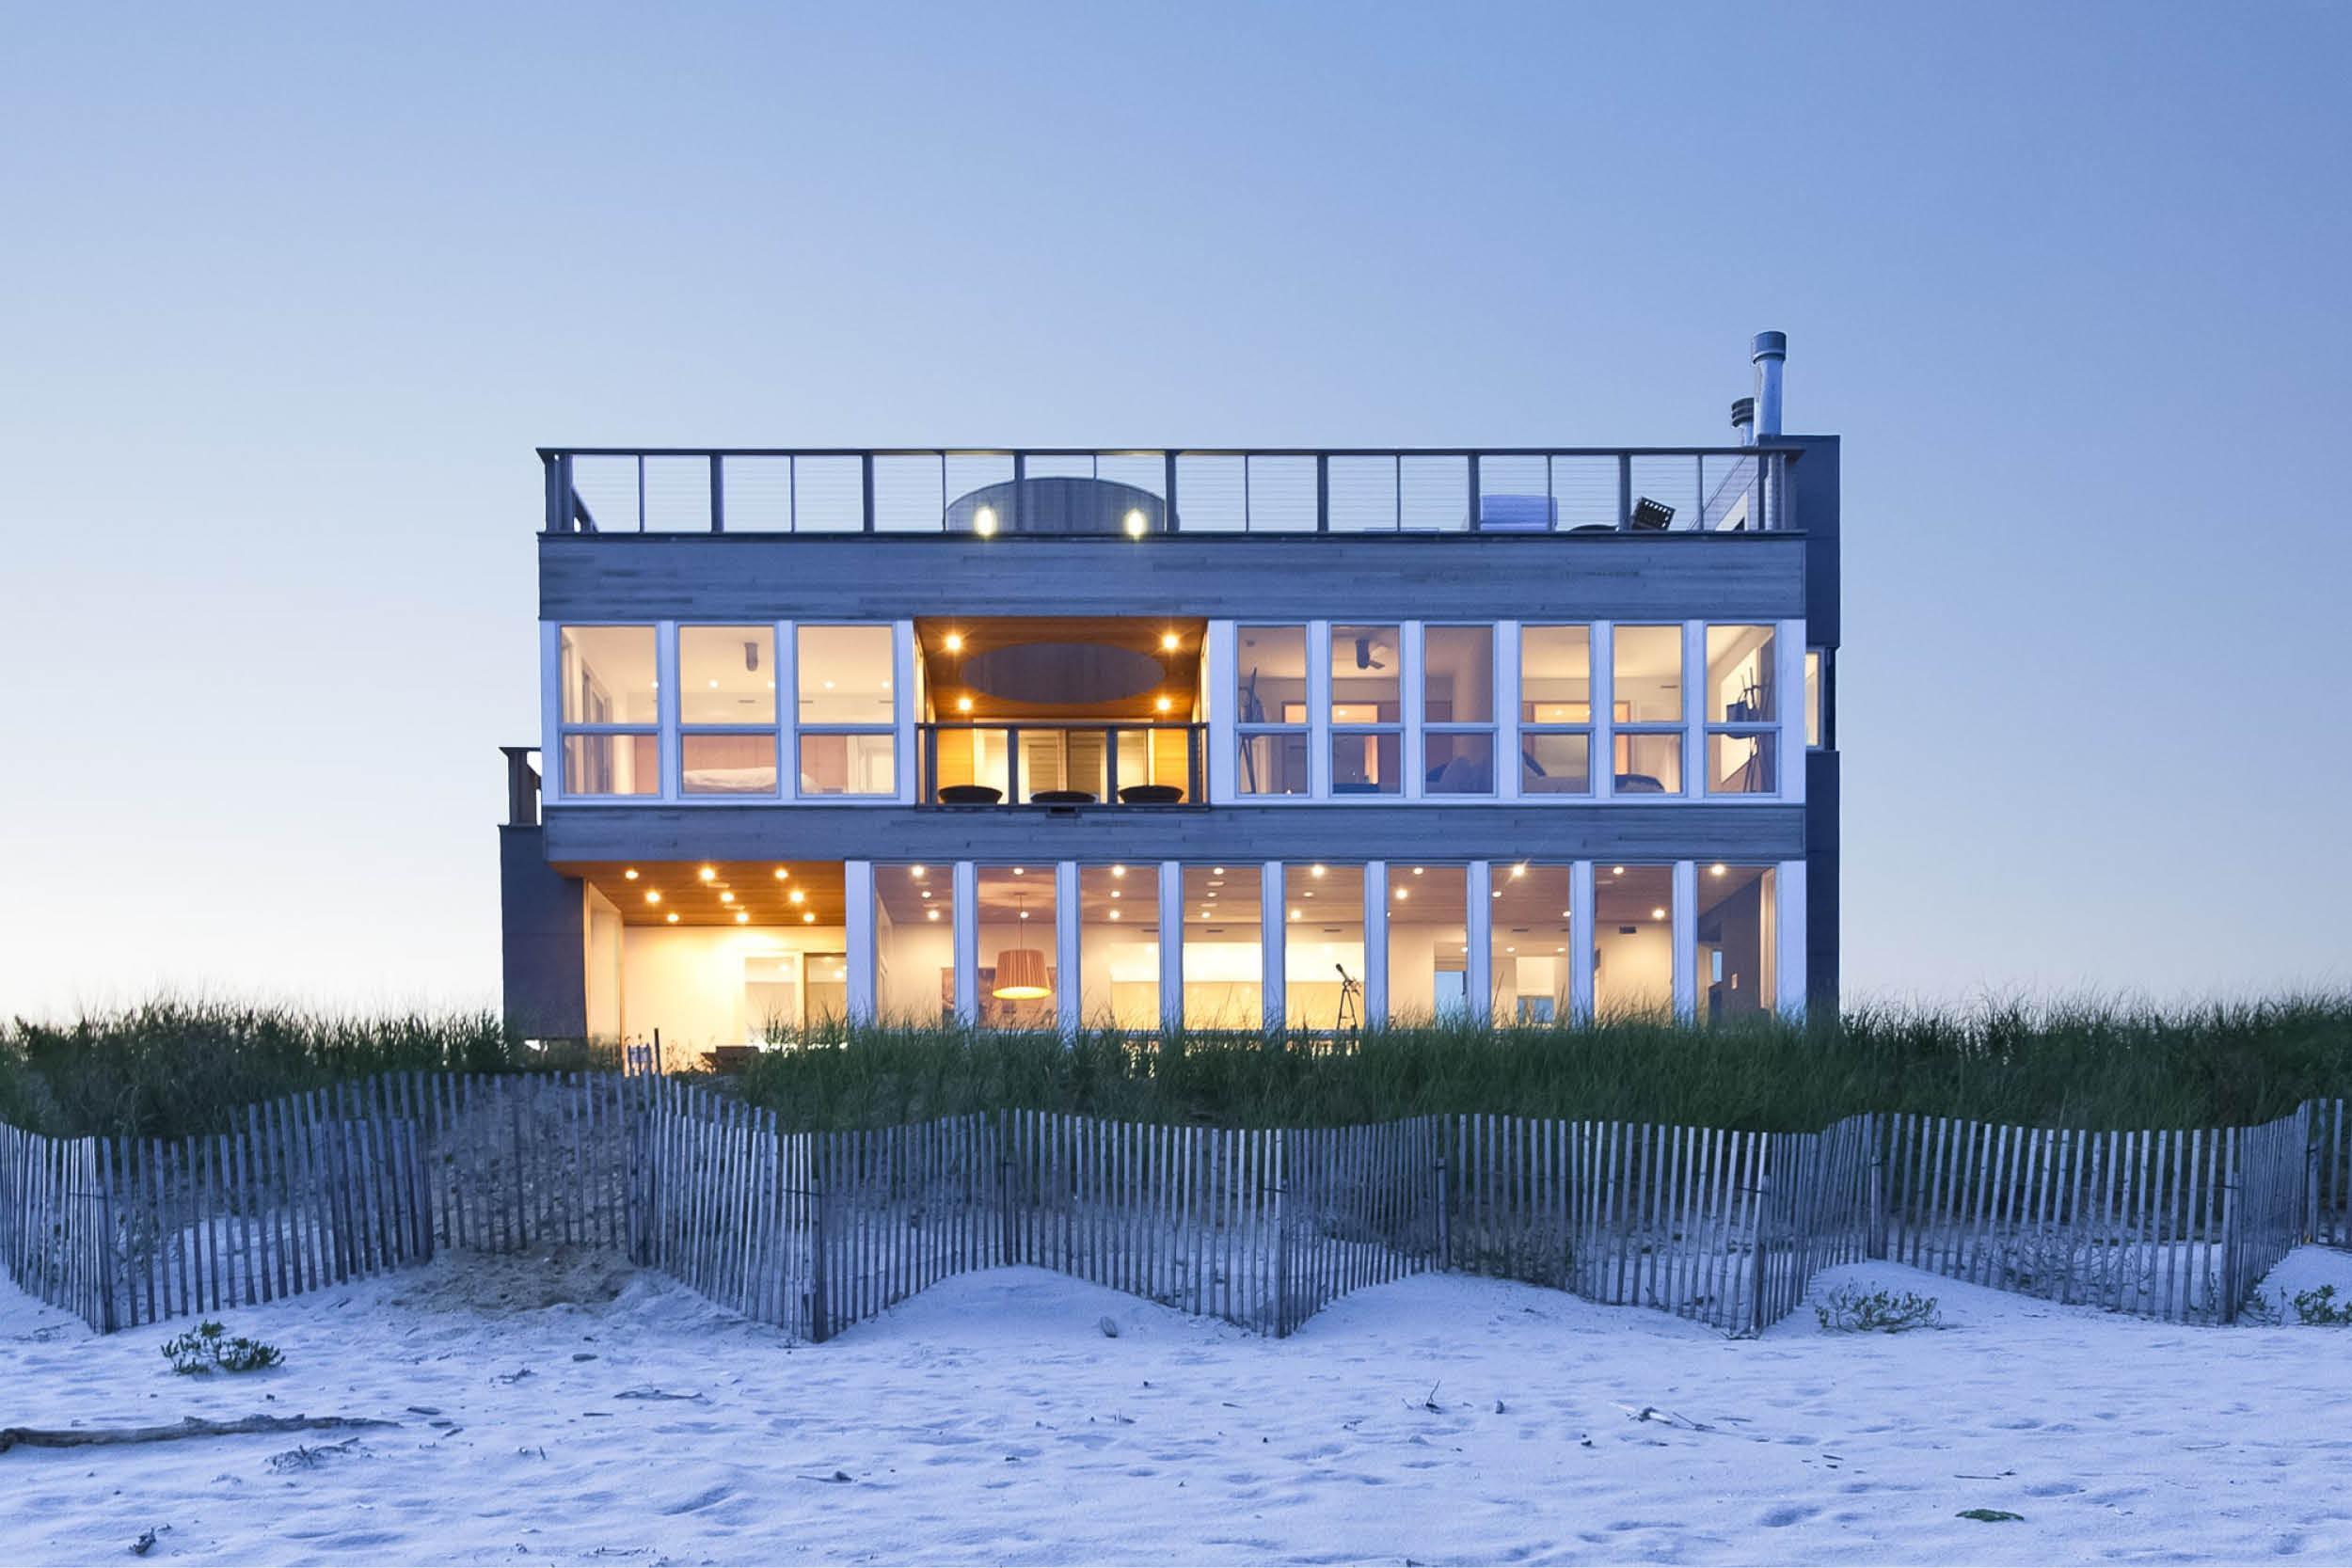 01-res4-resolution-4-architecture-modern-modular-home-prefab-dune-road-beach-house-exterior.jpg